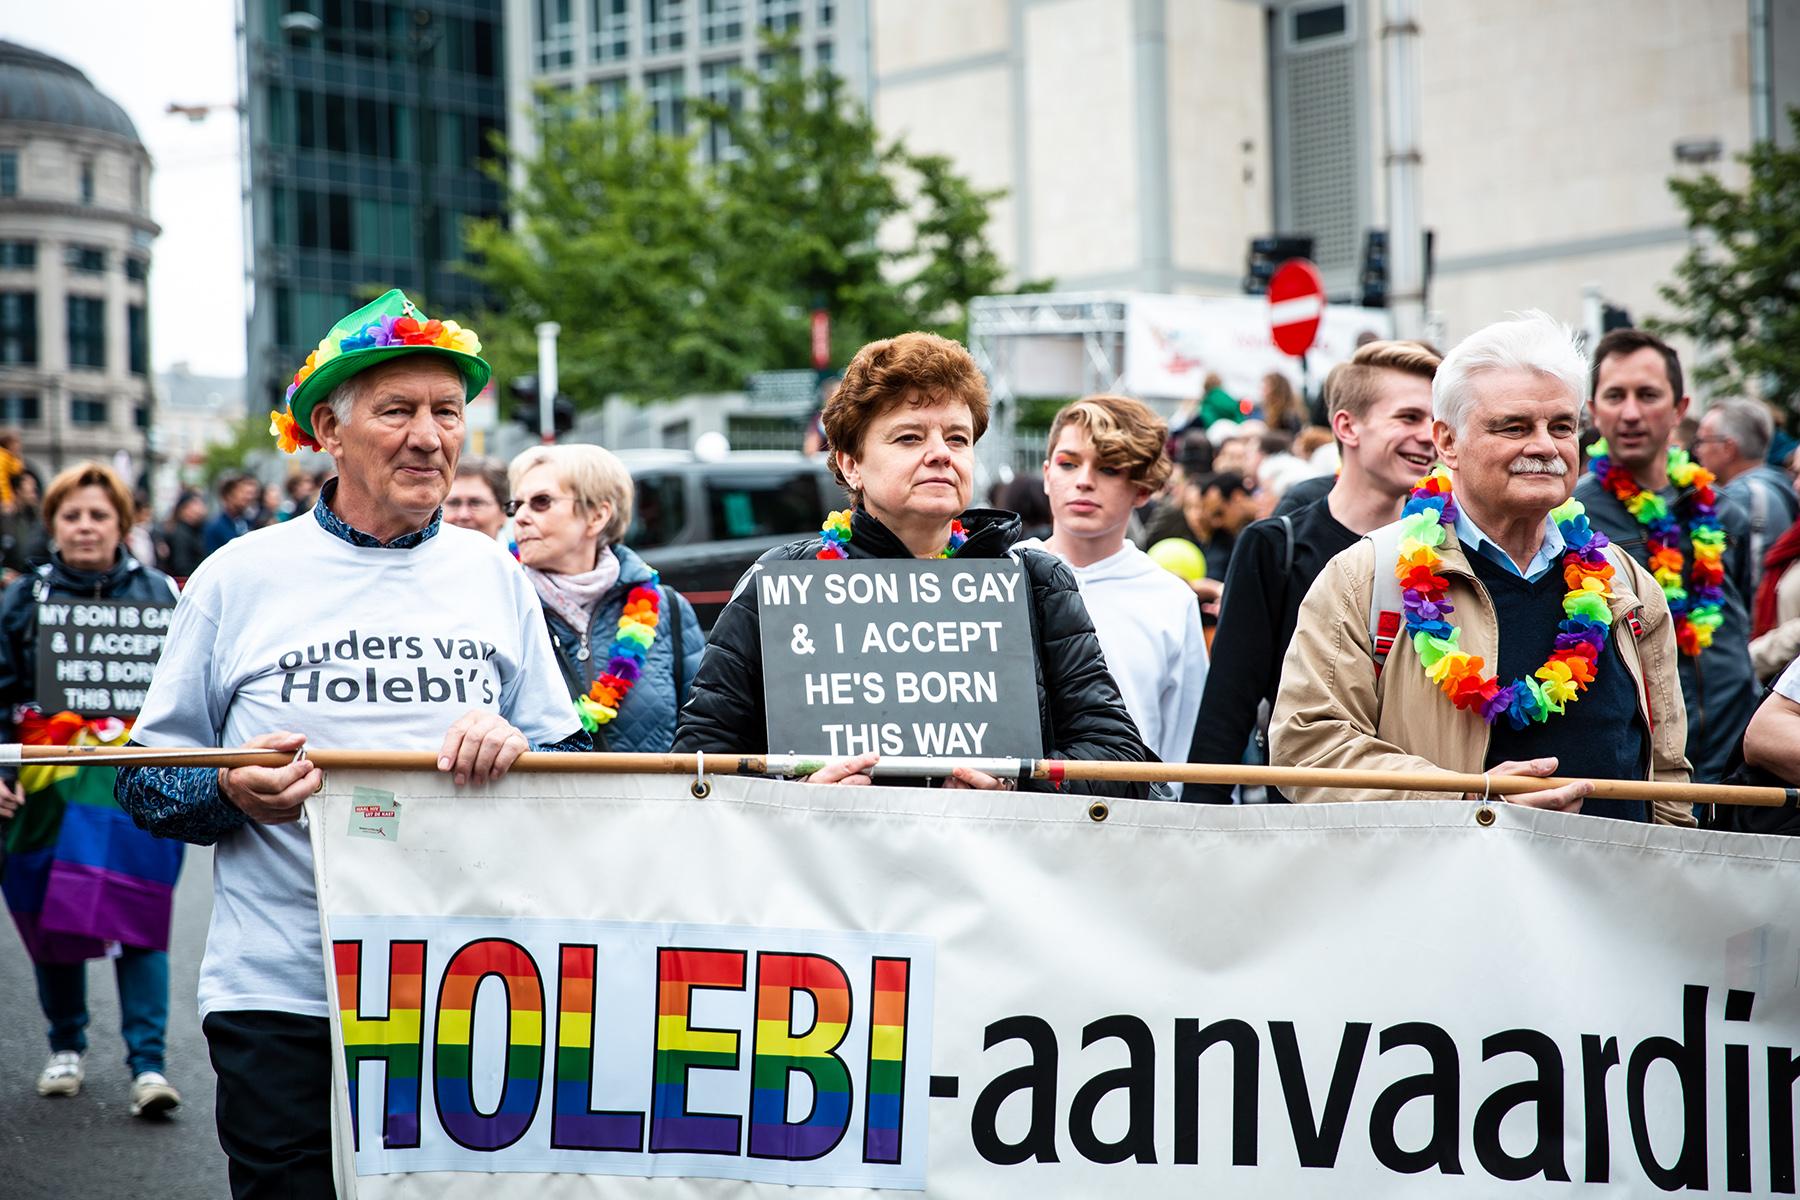 Brussels Pride Parade